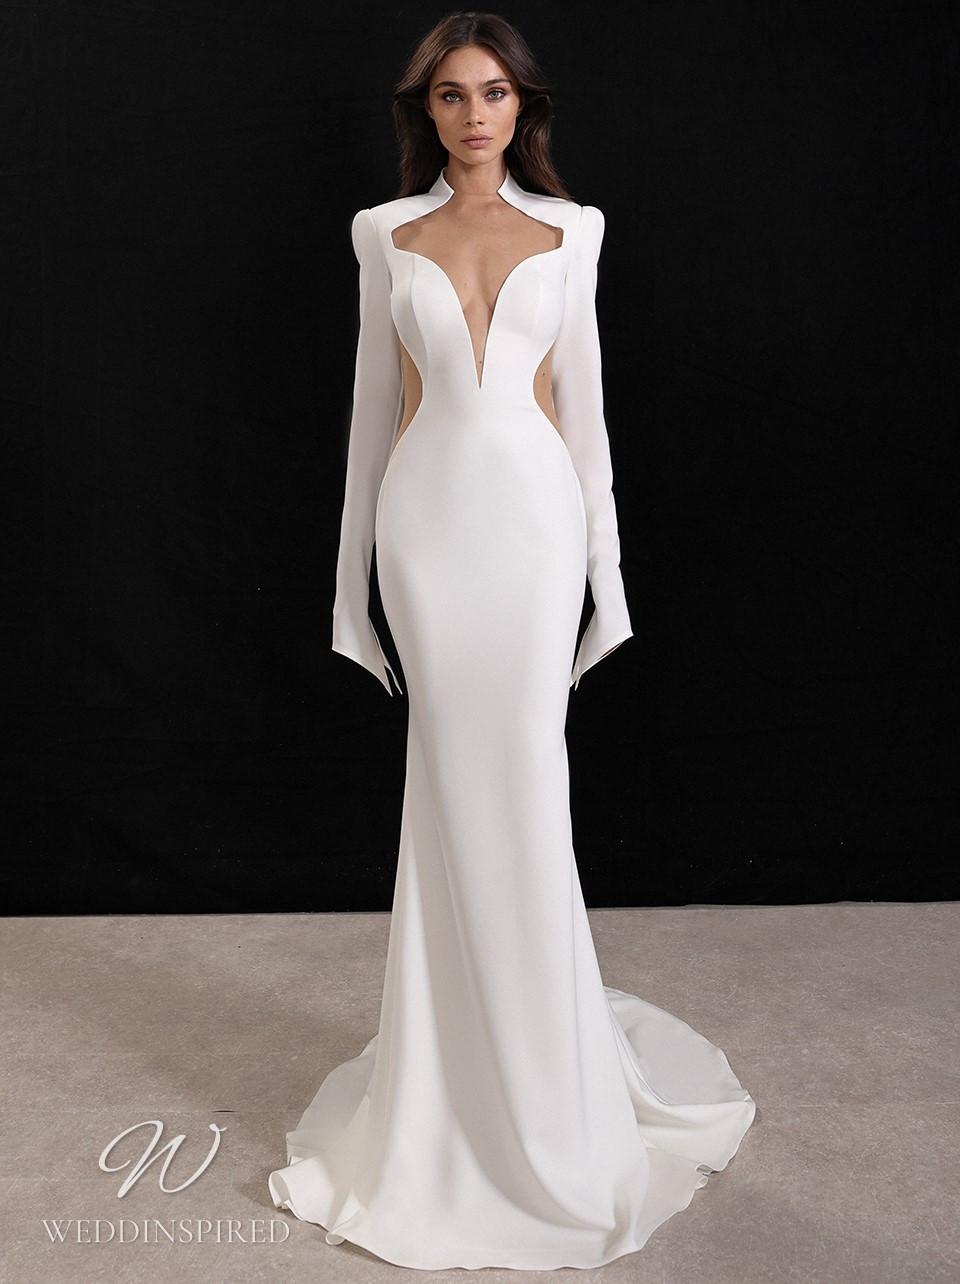 A Galia Lahav 2022 simple mermaid wedding dress with long sleeves